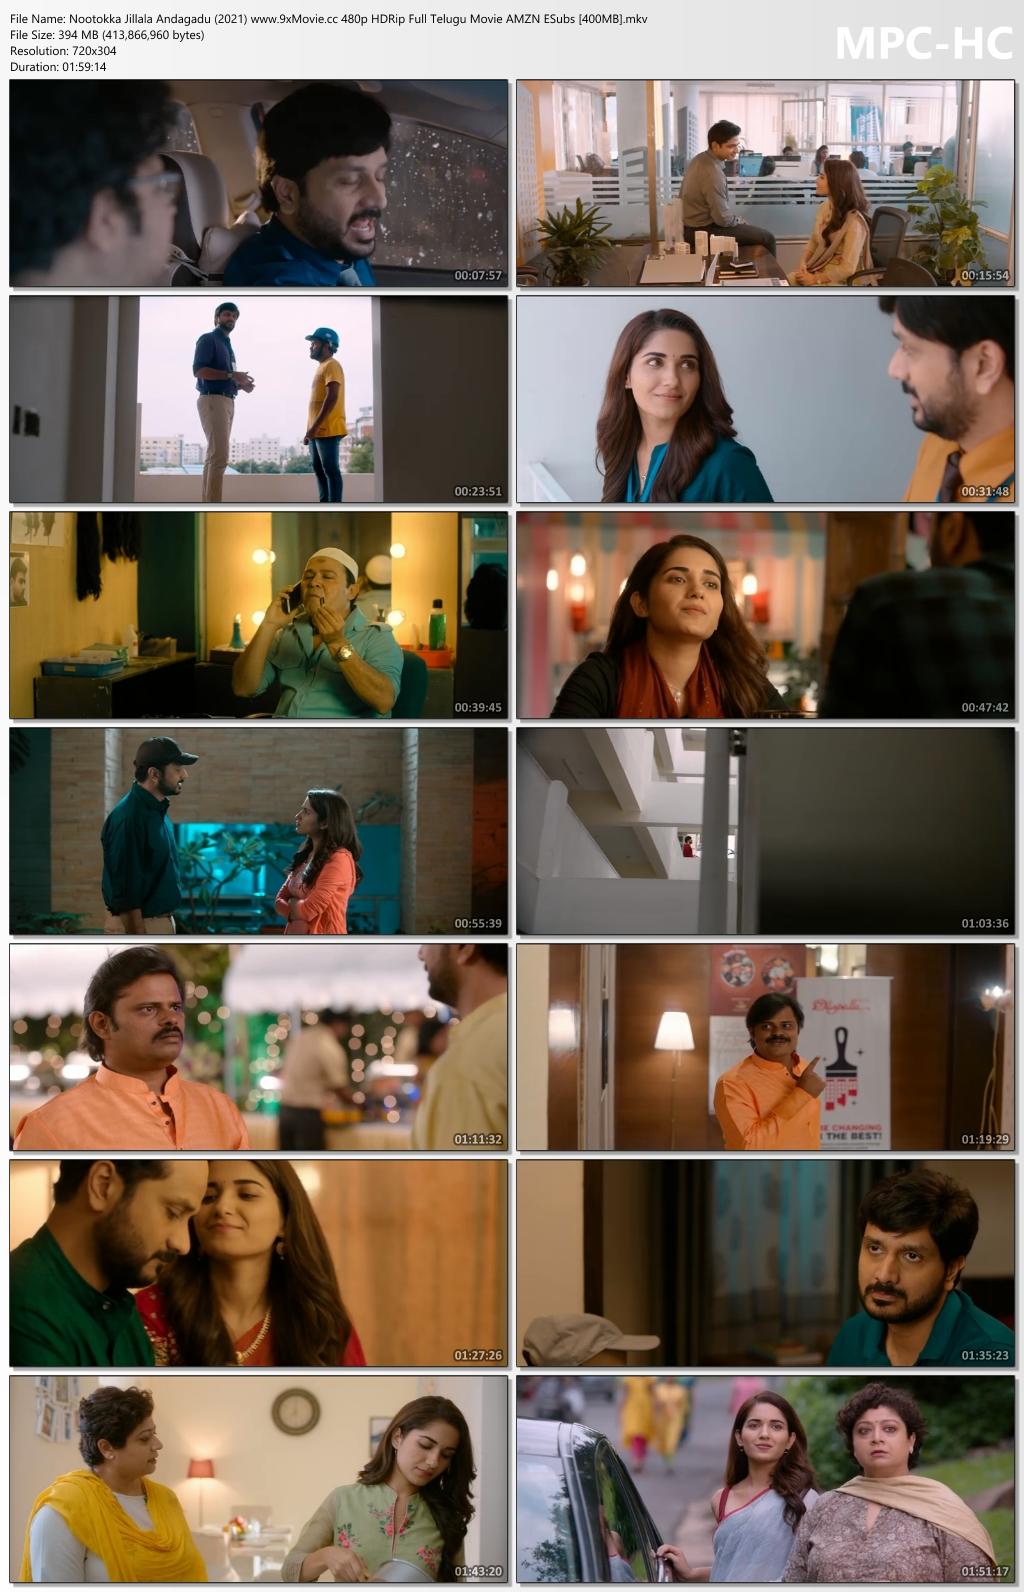 Nootokka-Jillala-Andagadu-2021-www-9x-Movie-cc-480p-HDRip-Full-Telugu-Movie-AMZN-ESubs-400-MB-mkv